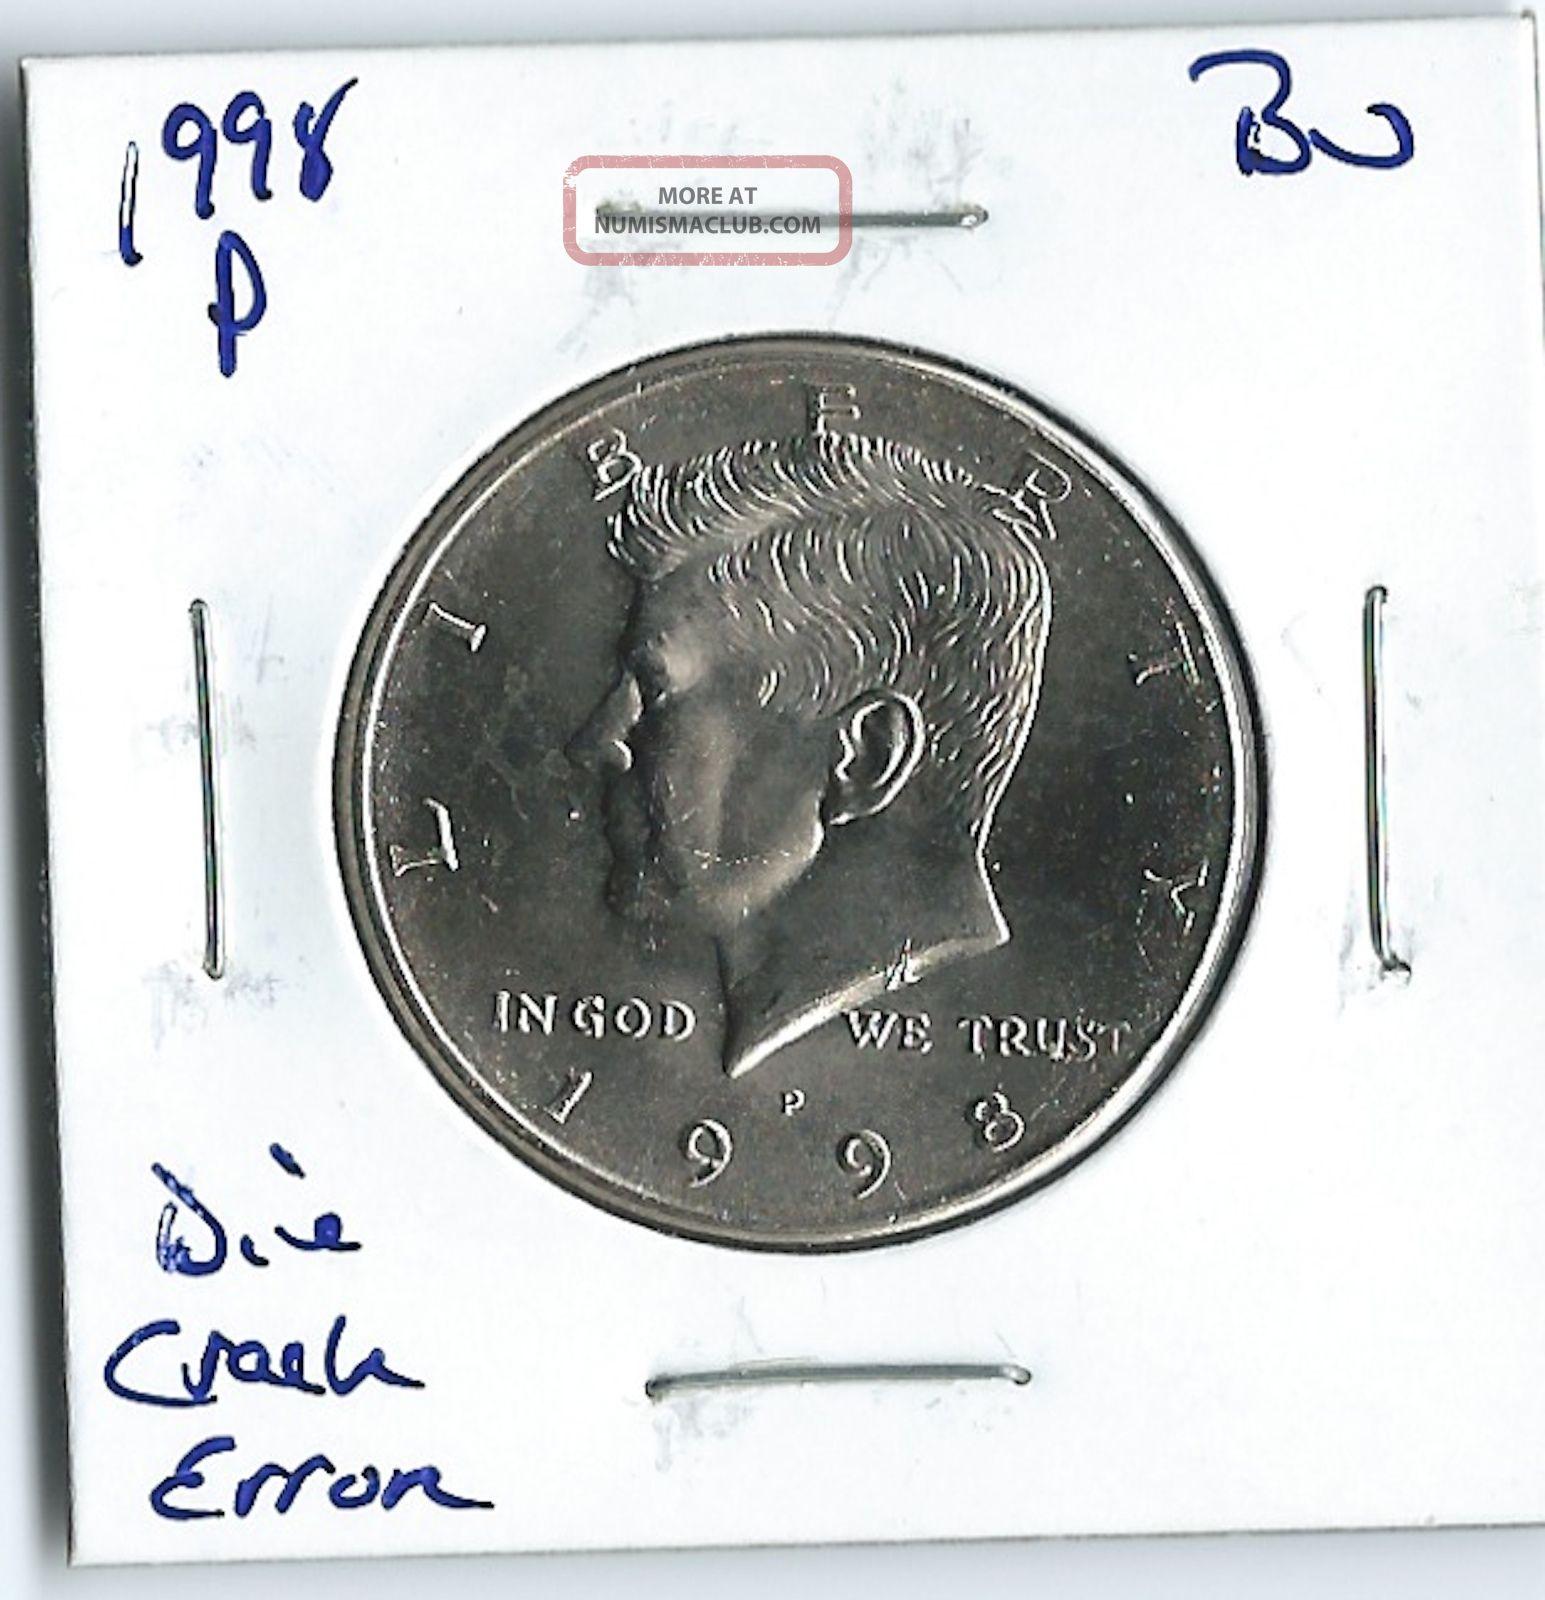 1998 P Kennedy Half Dollar Error Coin